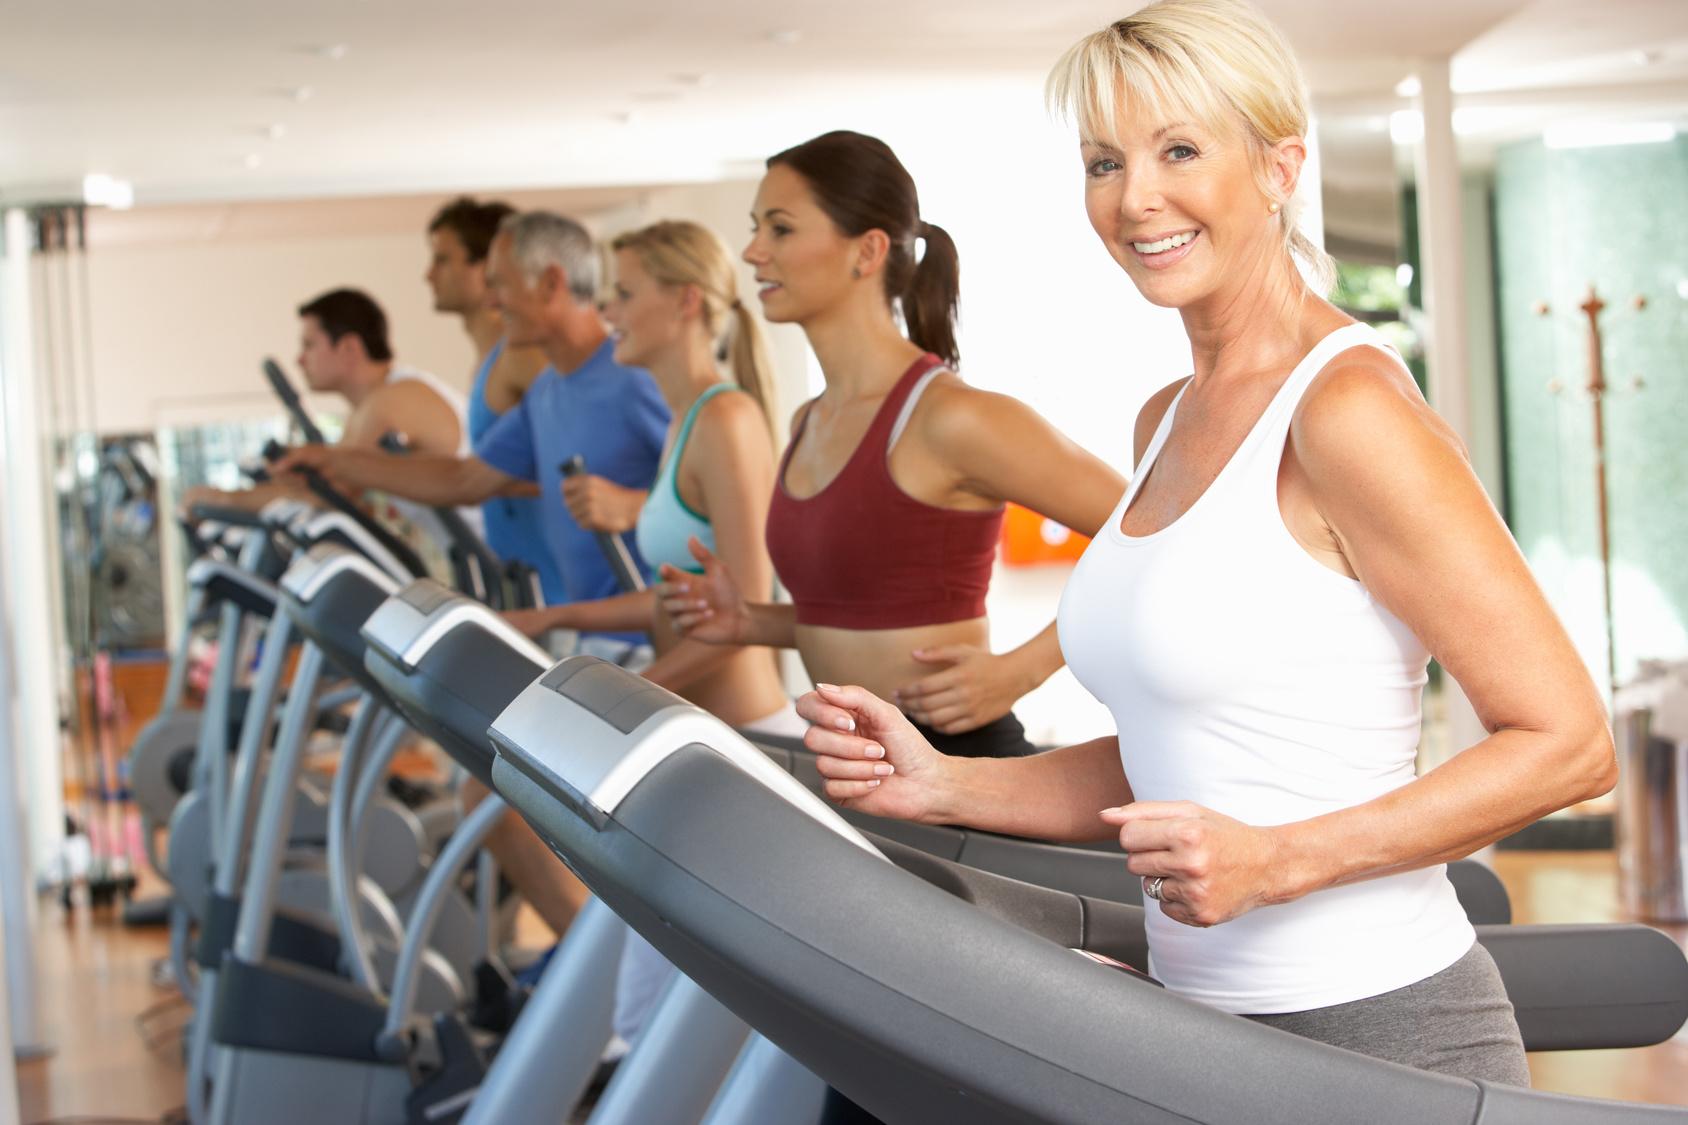 Senior Health and Fitness